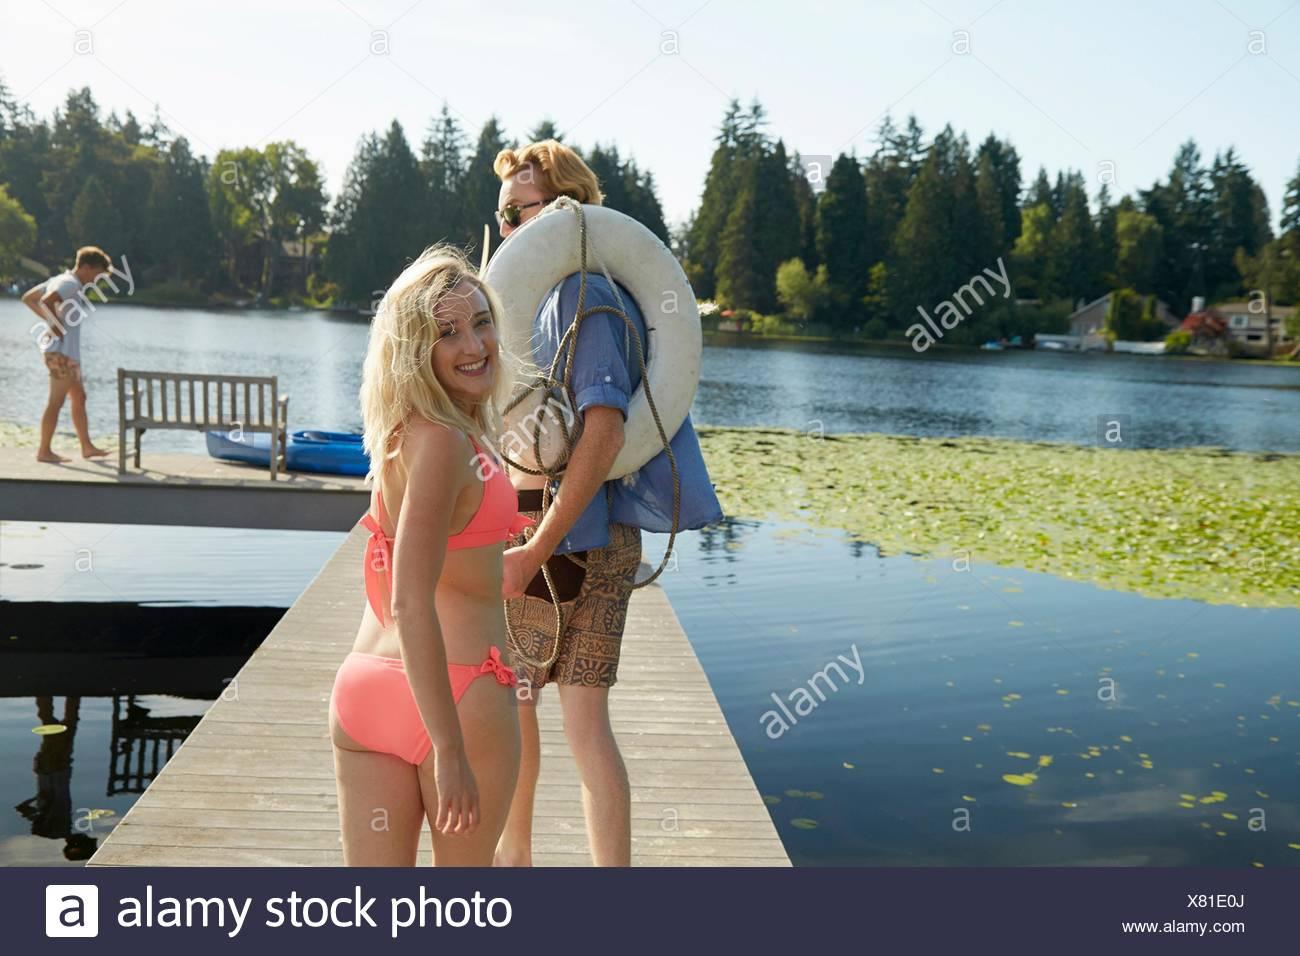 Friends going canoeing in lake, Seattle, Washington, USA - Stock Image